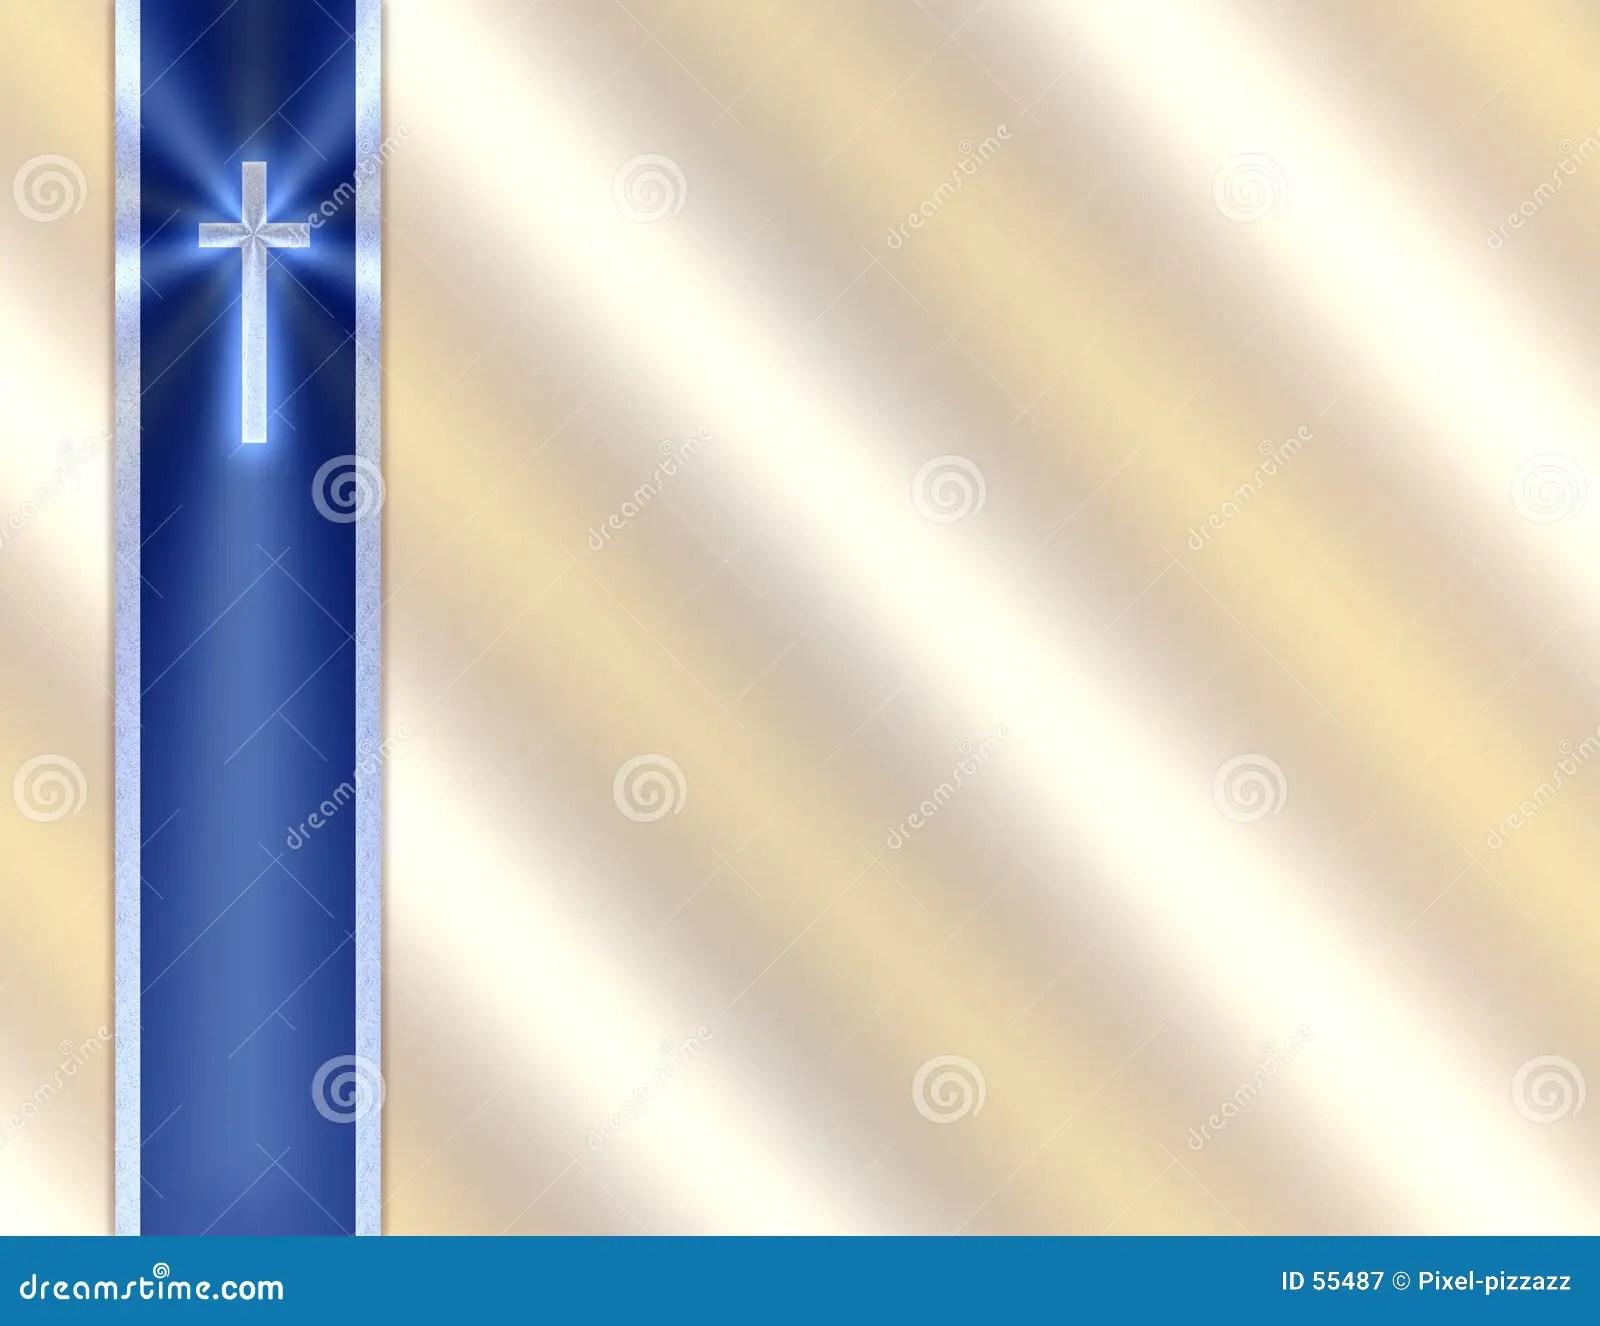 Cross Wallpapers Free: Blue Funeral Program Borders